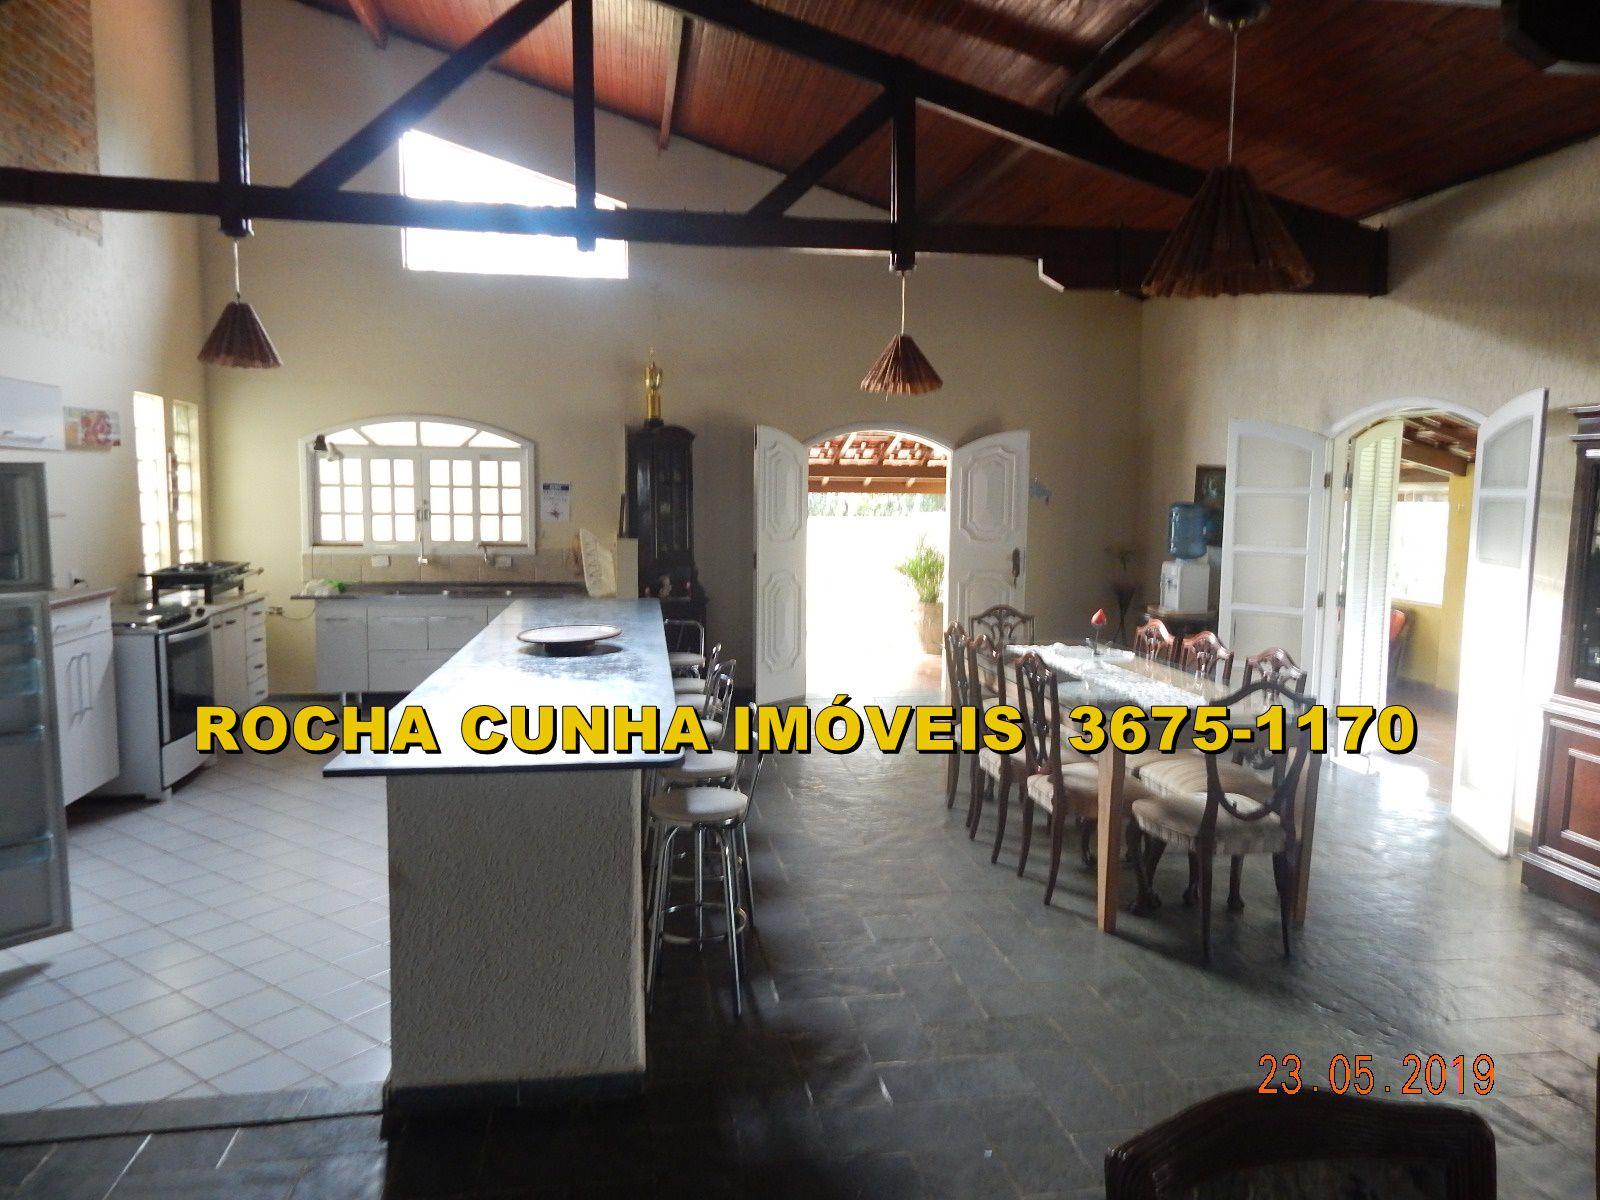 Chácara à venda Santana de Parnaíba,SP - R$ 780.000 - CHACARA0010 - 19